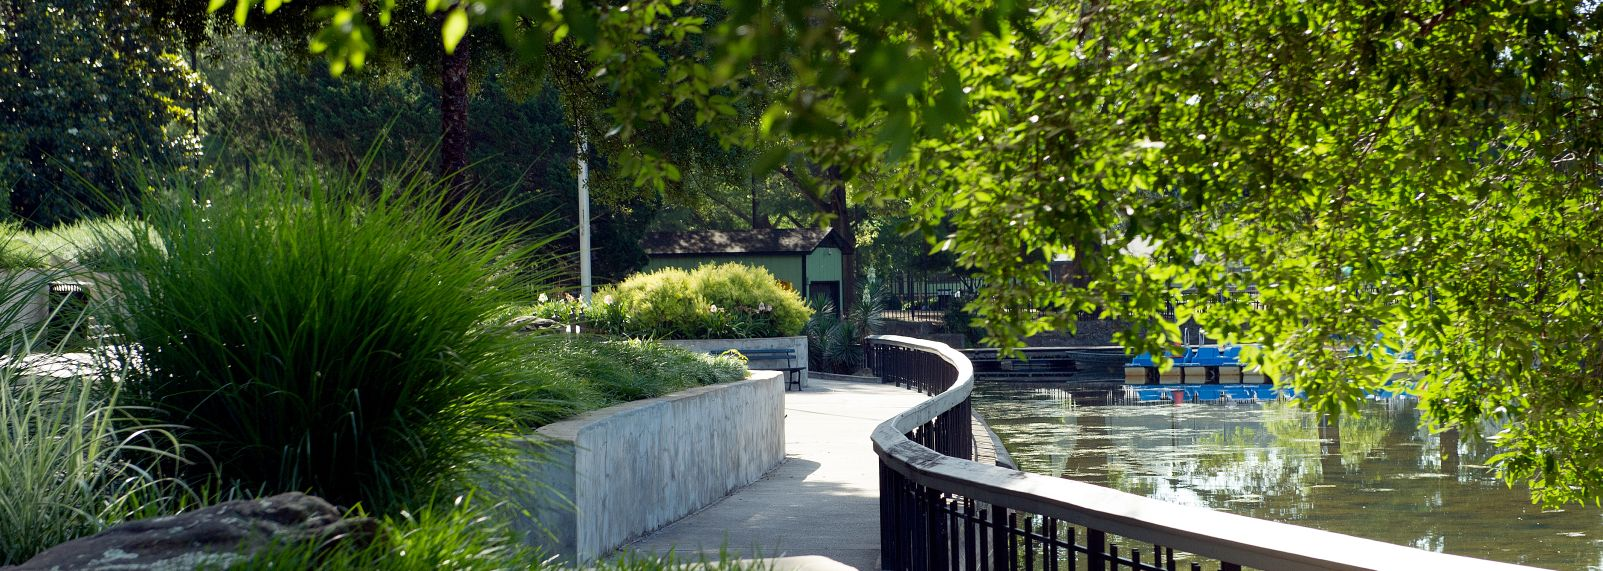 Pullen Park 21-204.jpg